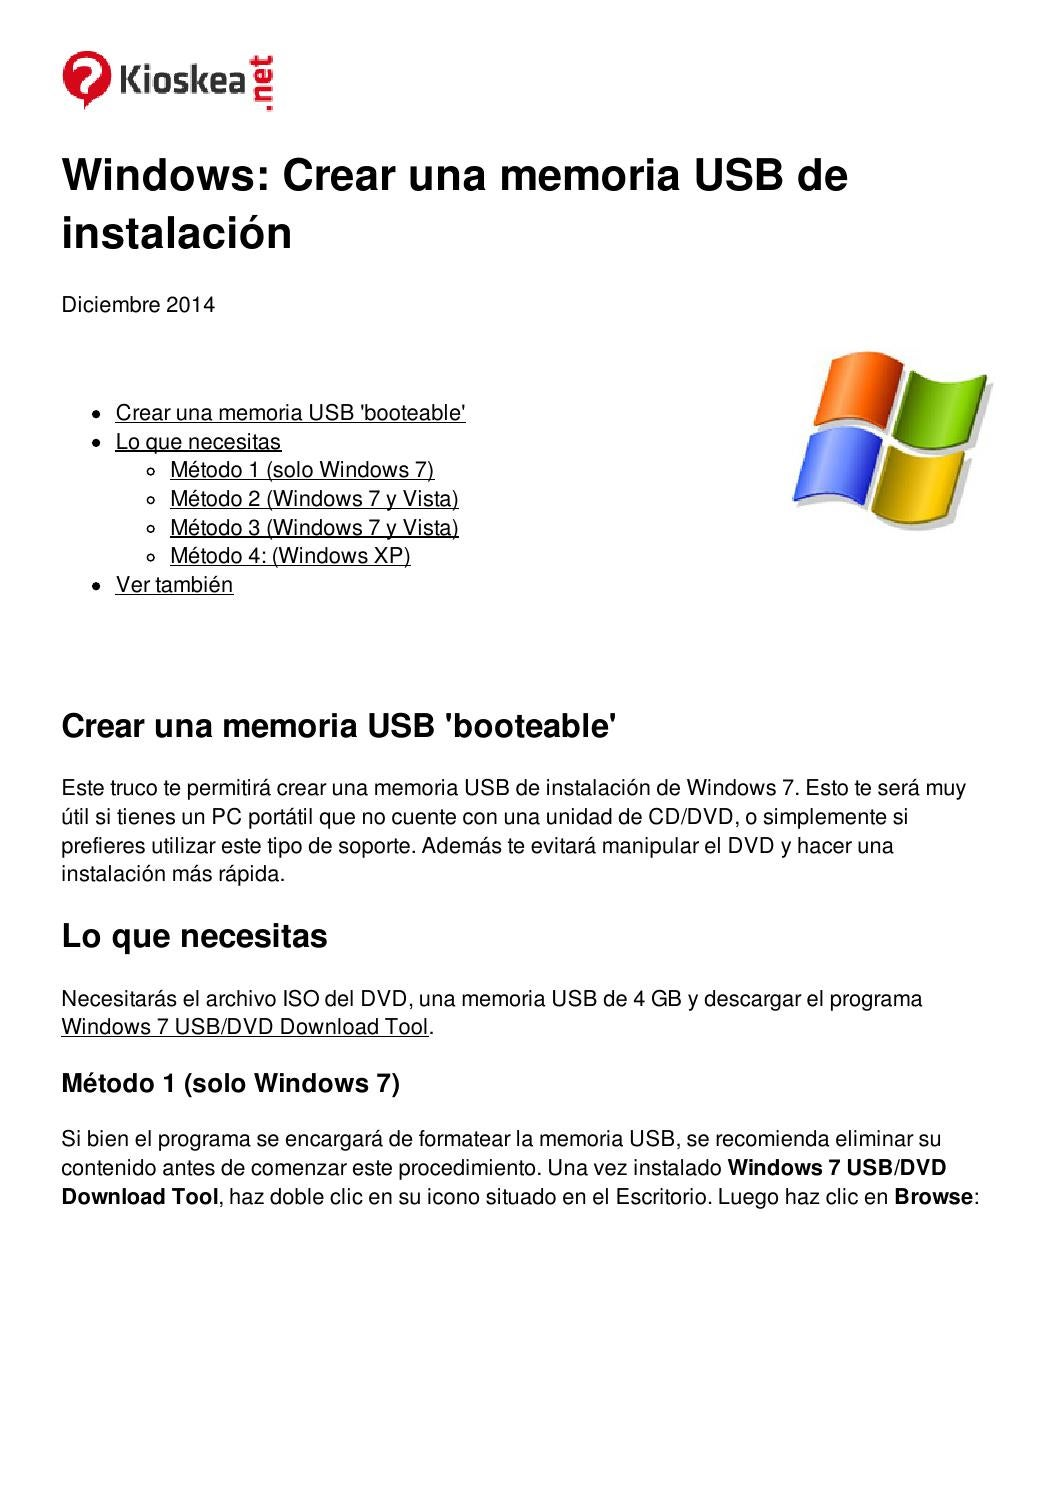 Os en una memoria USB